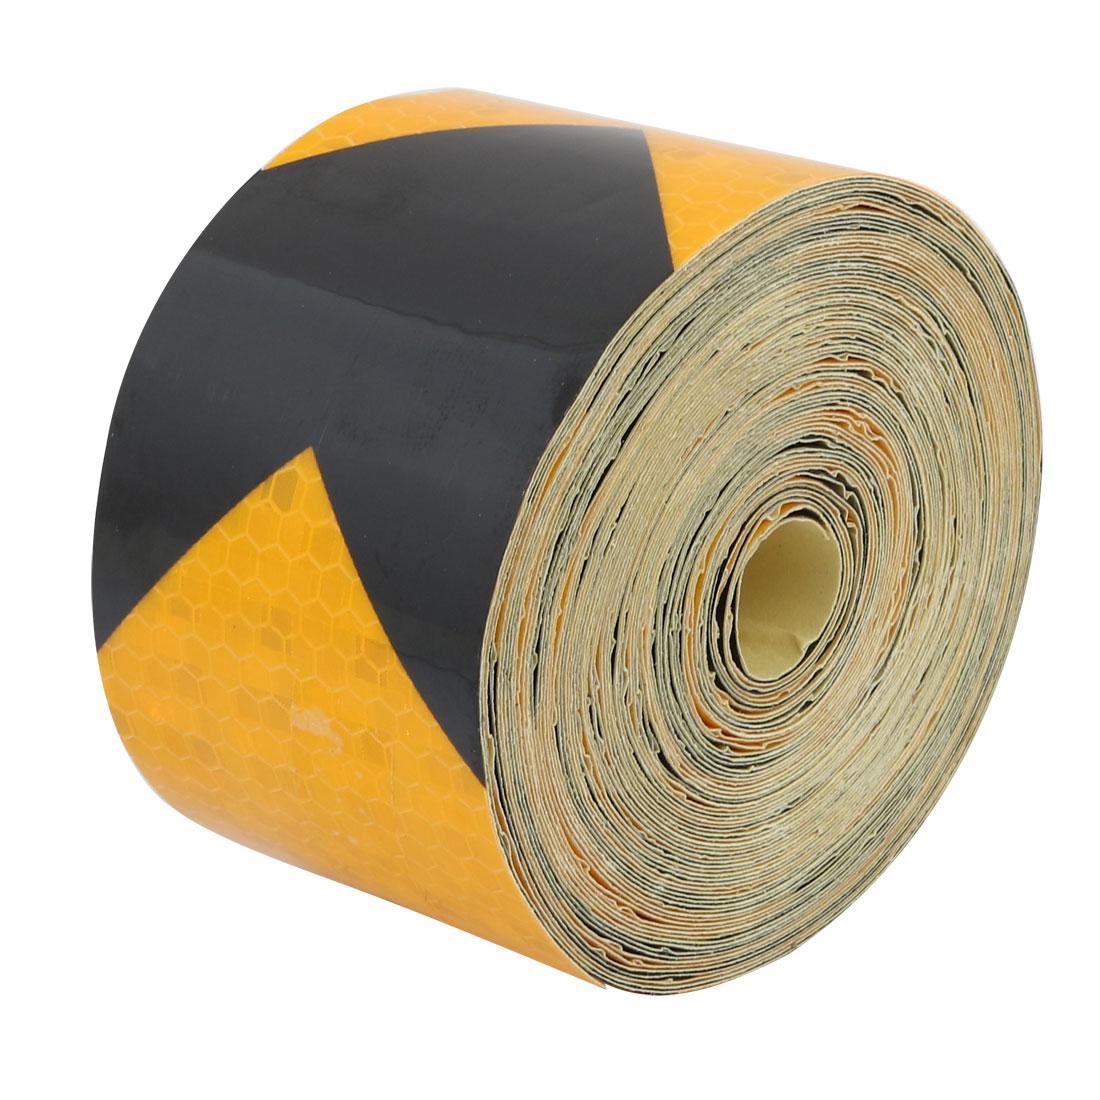 10Meter Length 5cm Wide Honeycomb Adhesive Reflective Warning Tape Yellow Black